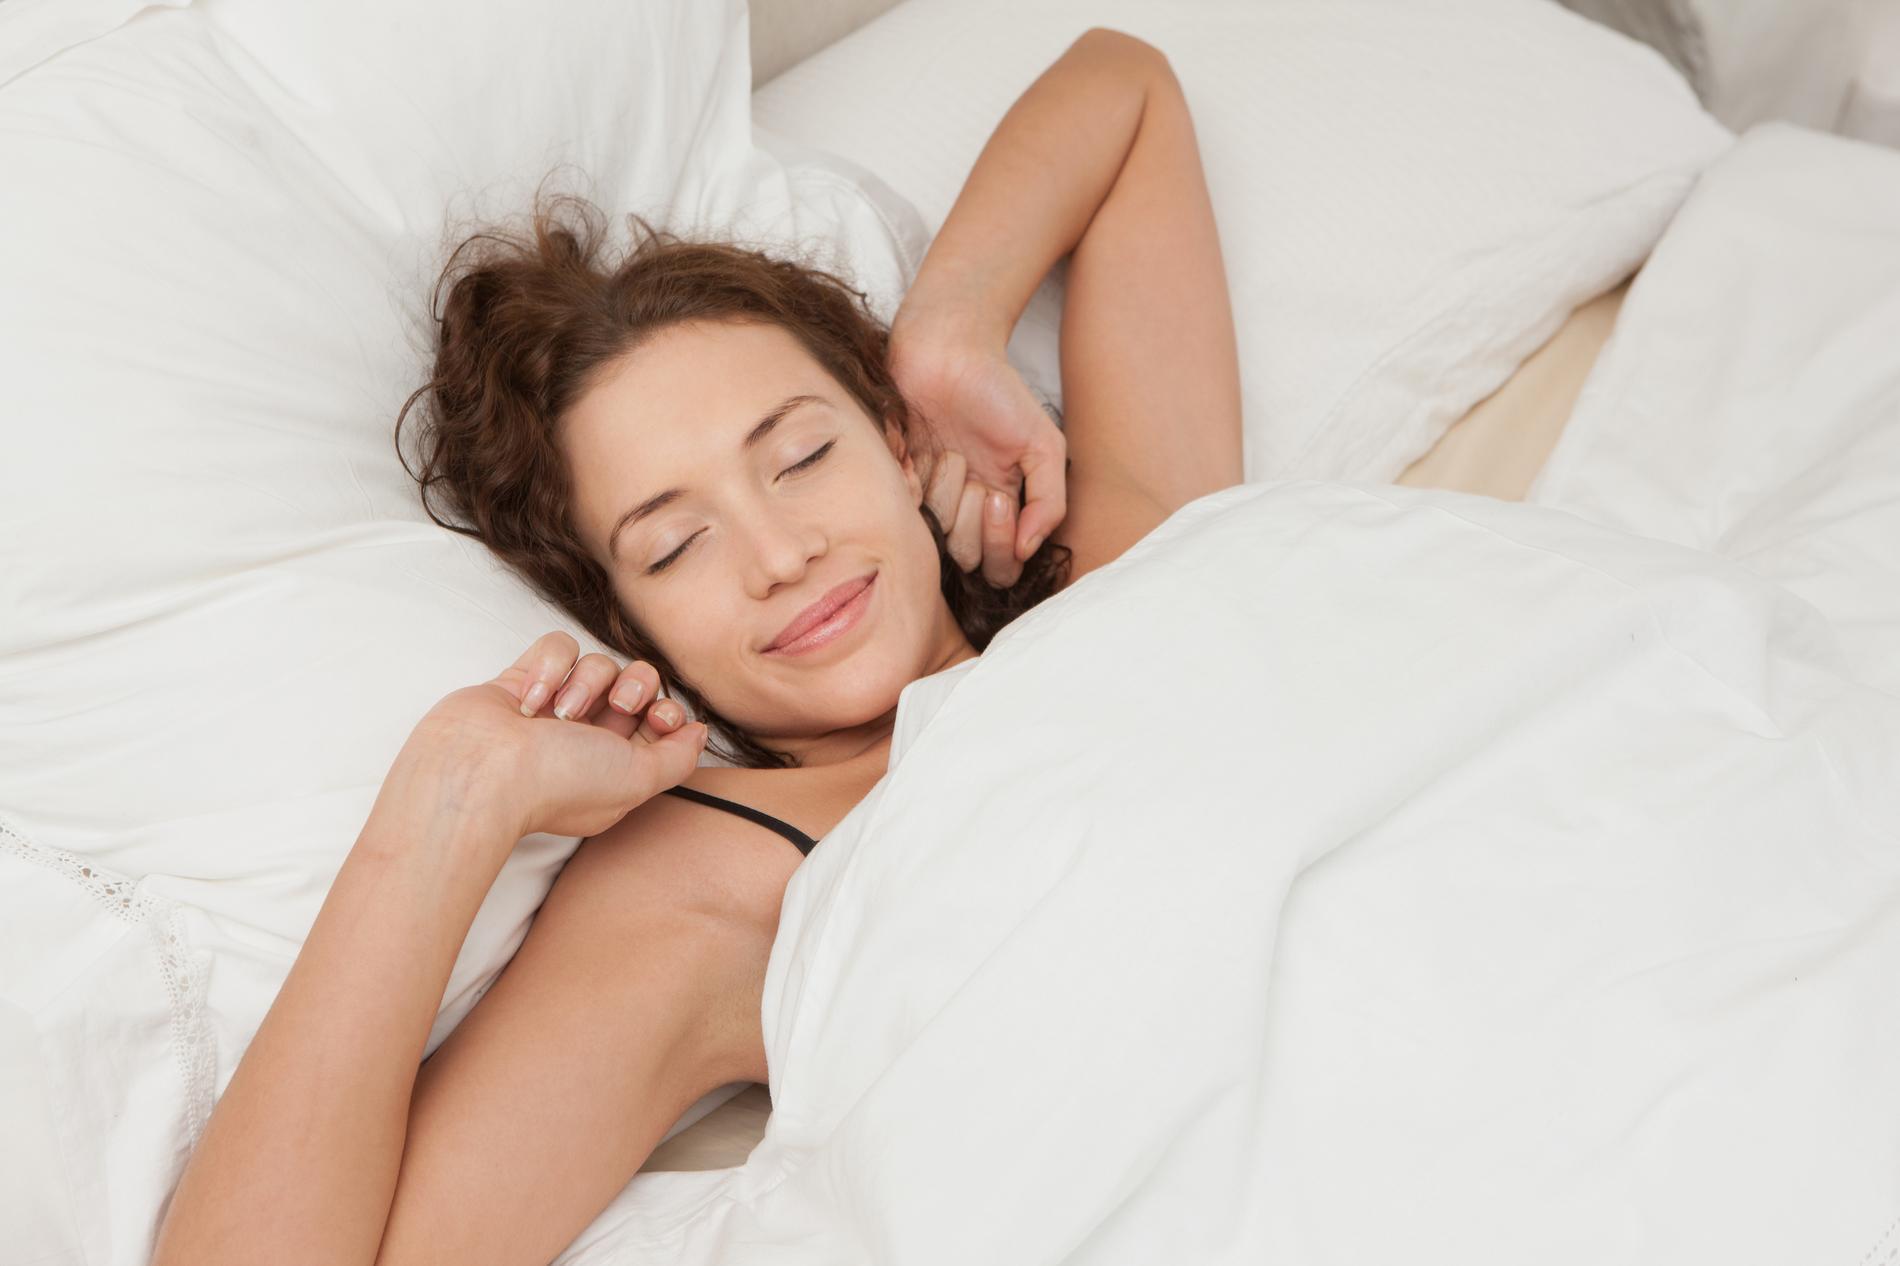 dormir adolescent fille sexe